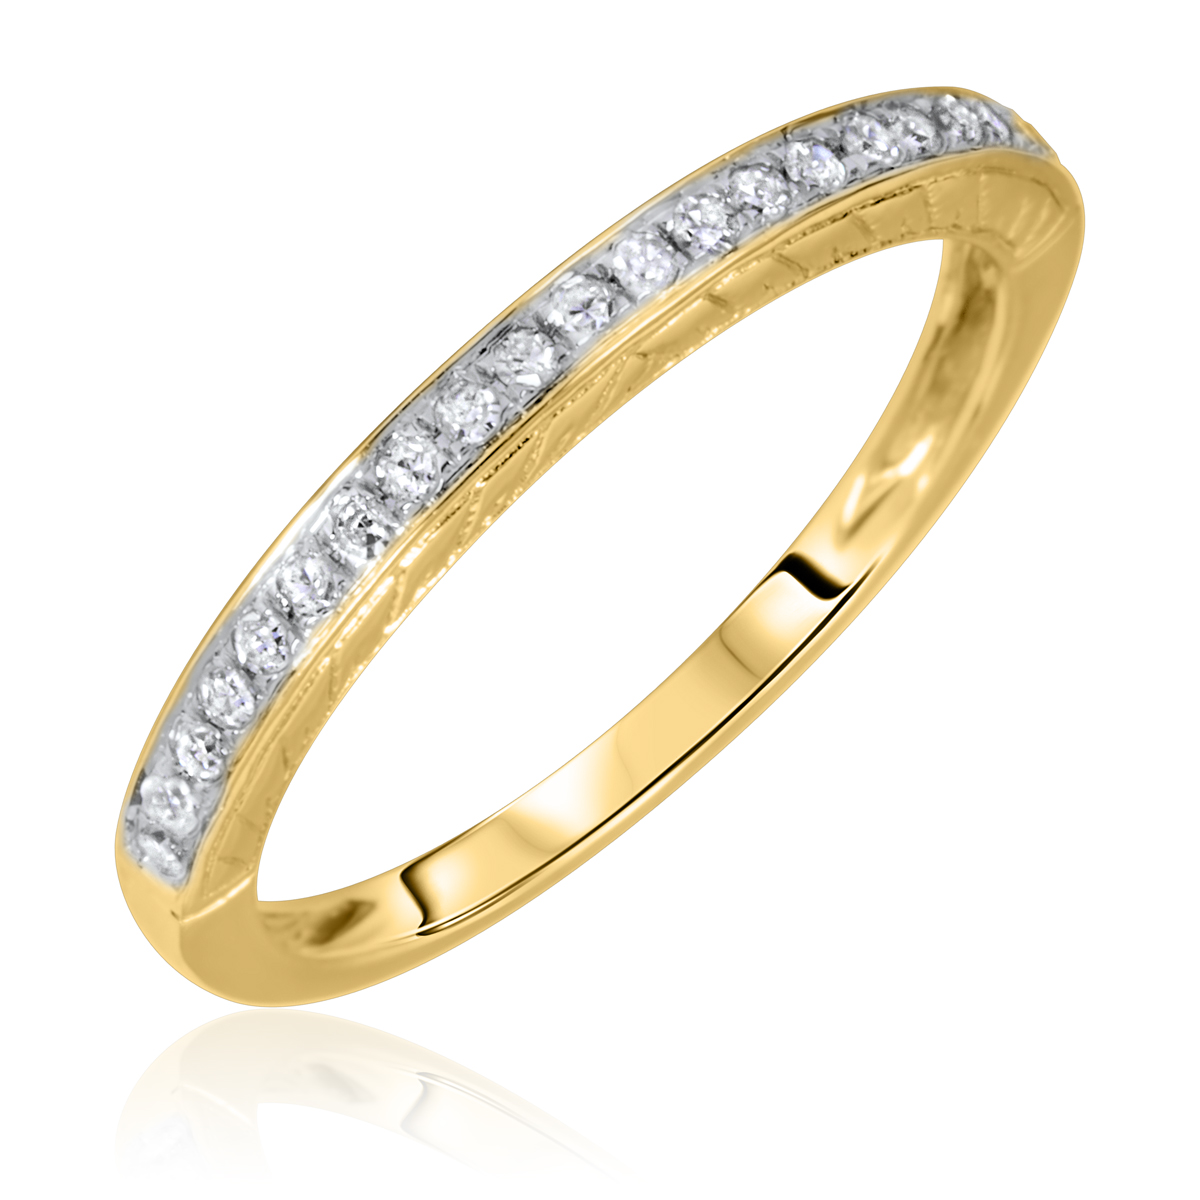 1/8 Carat T.W. Rounds Cut Diamond Ladies Wedding Band 14K Yellow Gold- Size 8